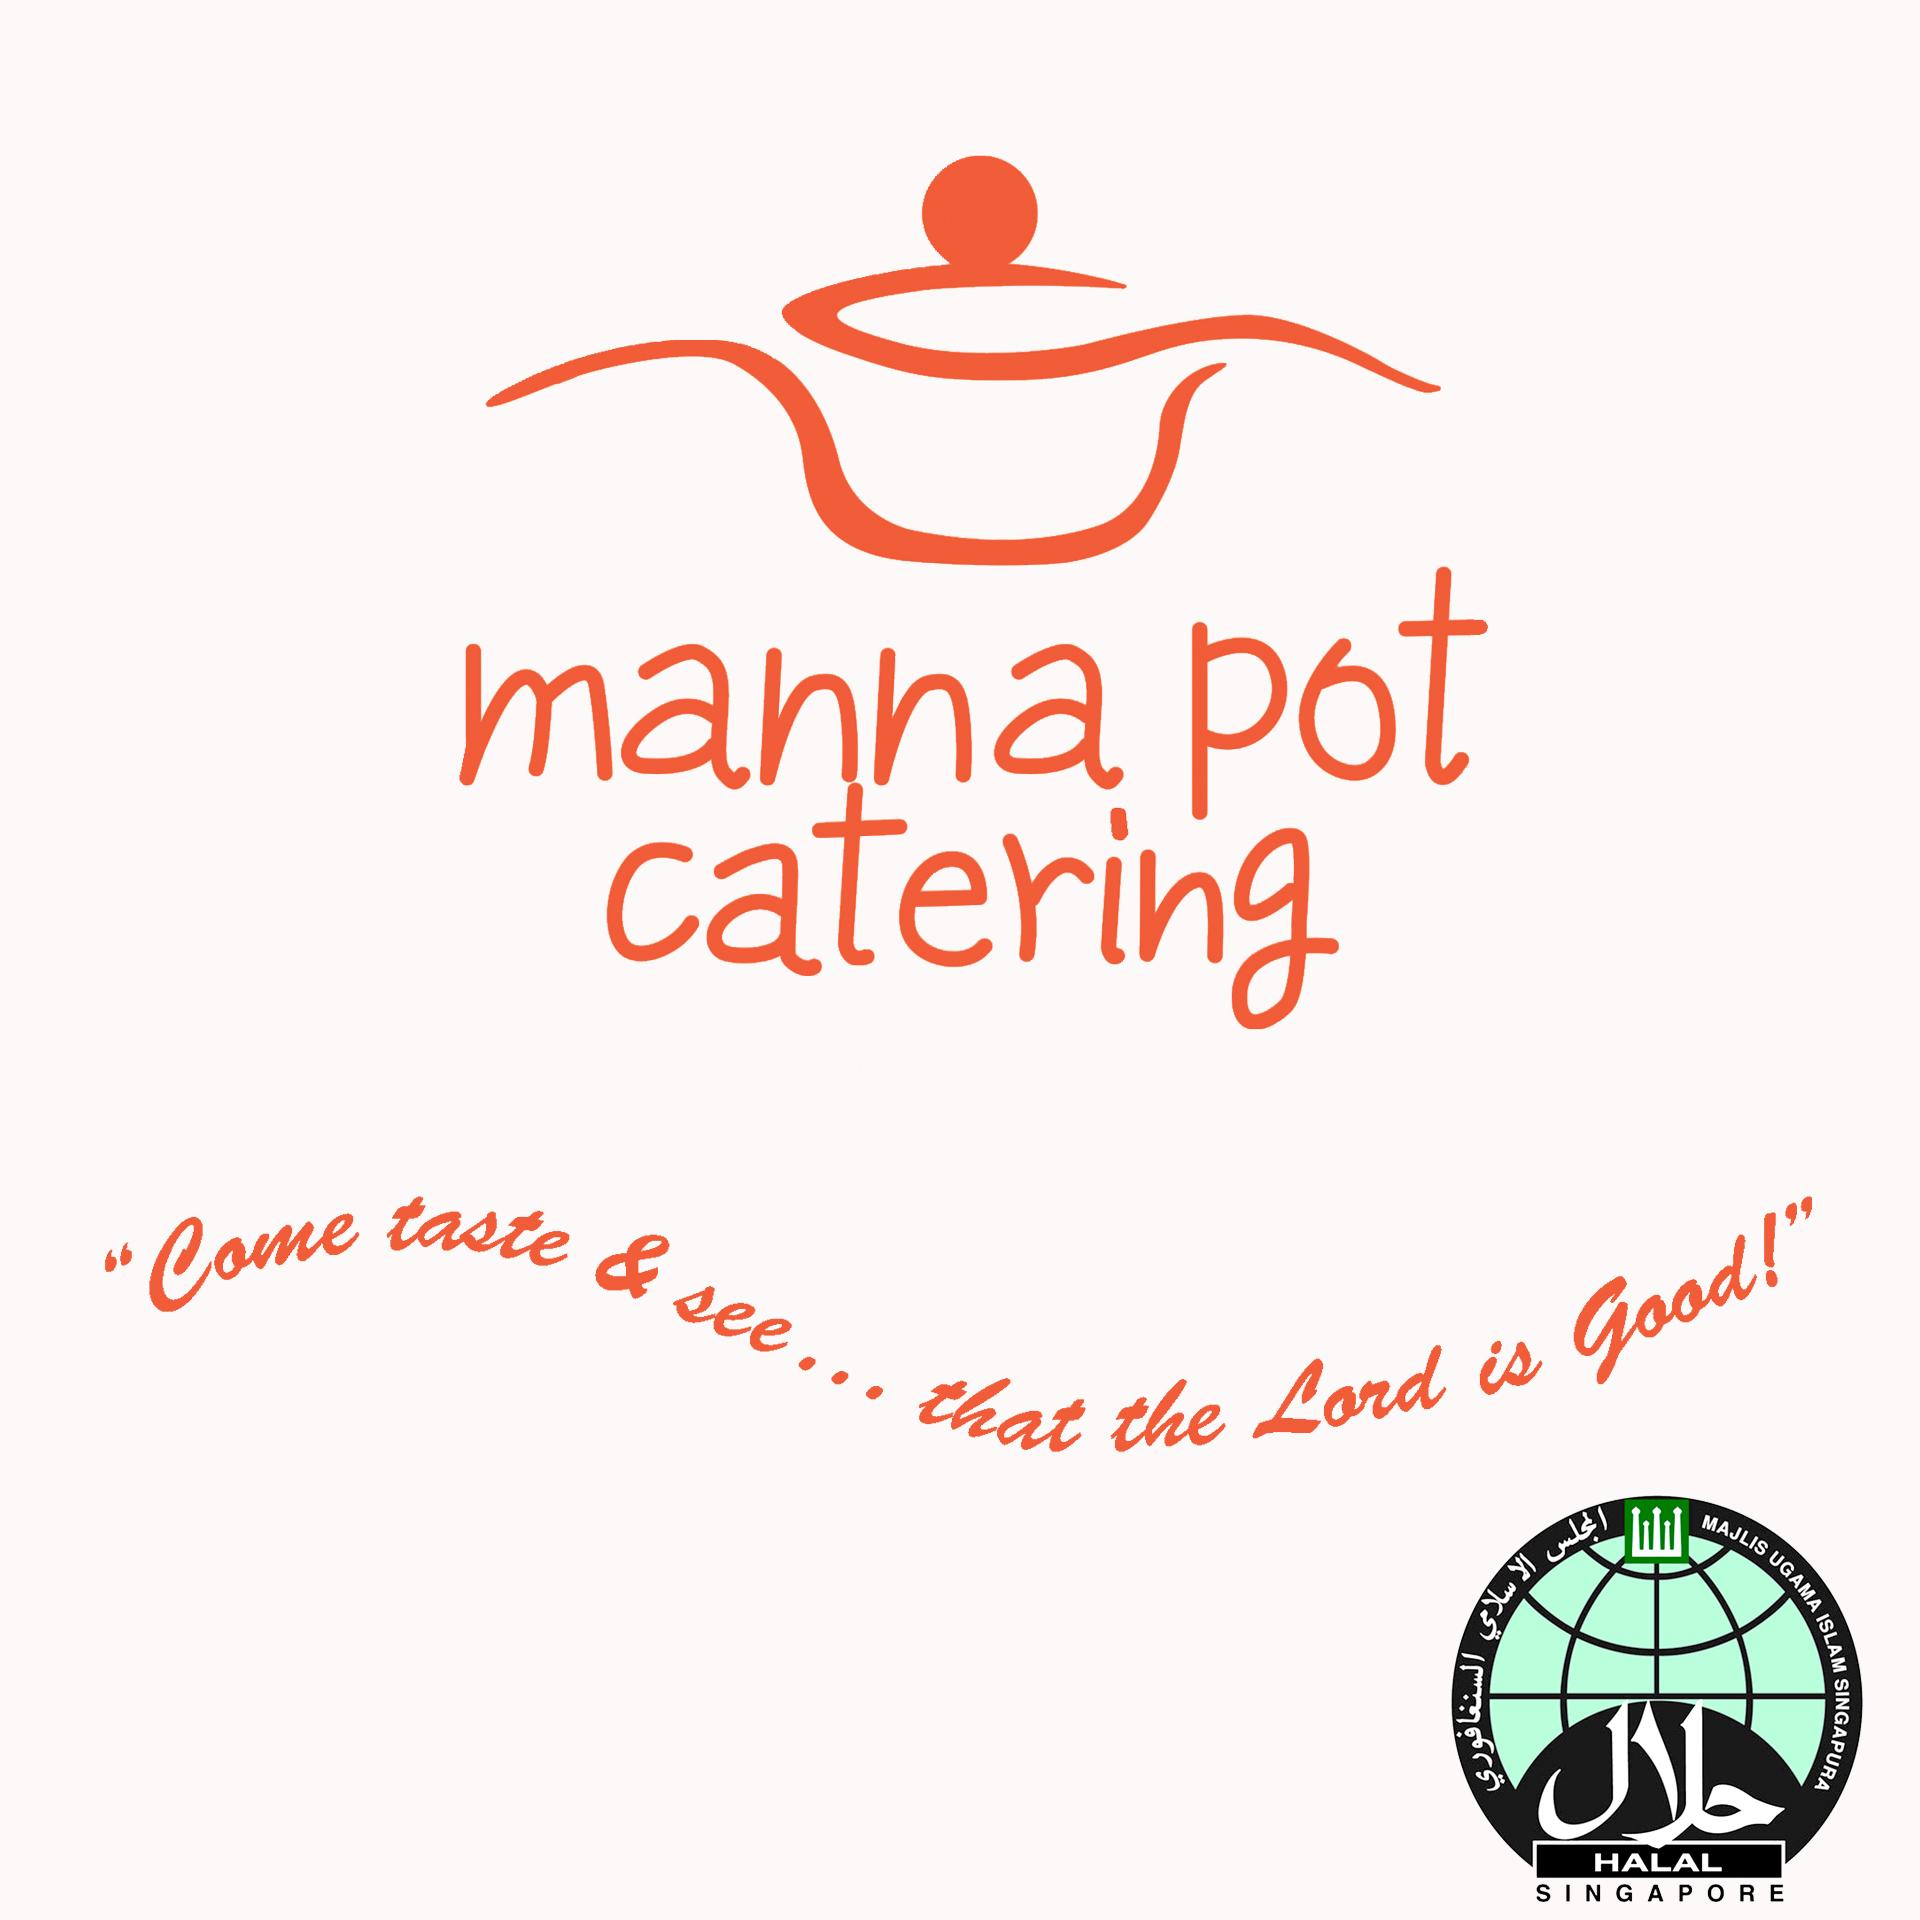 Manna Pot Catering image